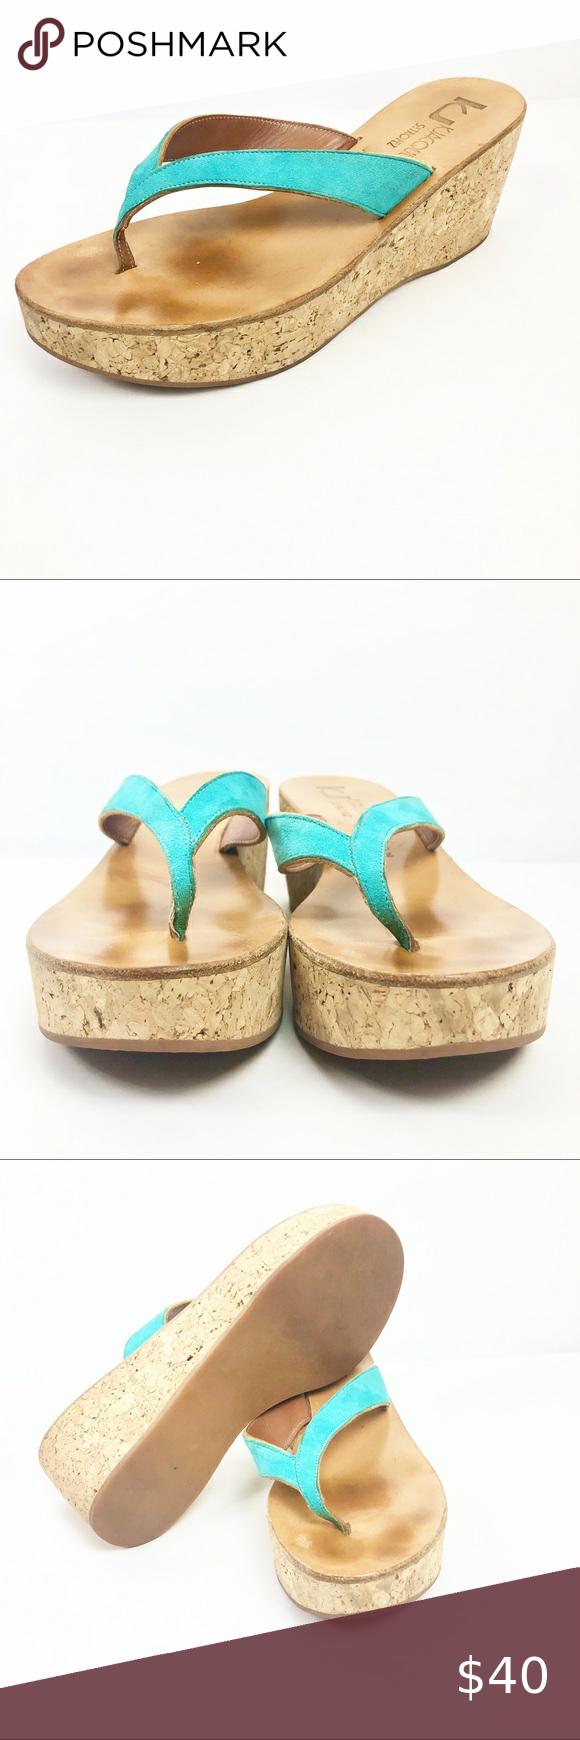 K Jacques St Tropez France Ladies Wedge Sandal 8 M in 2020